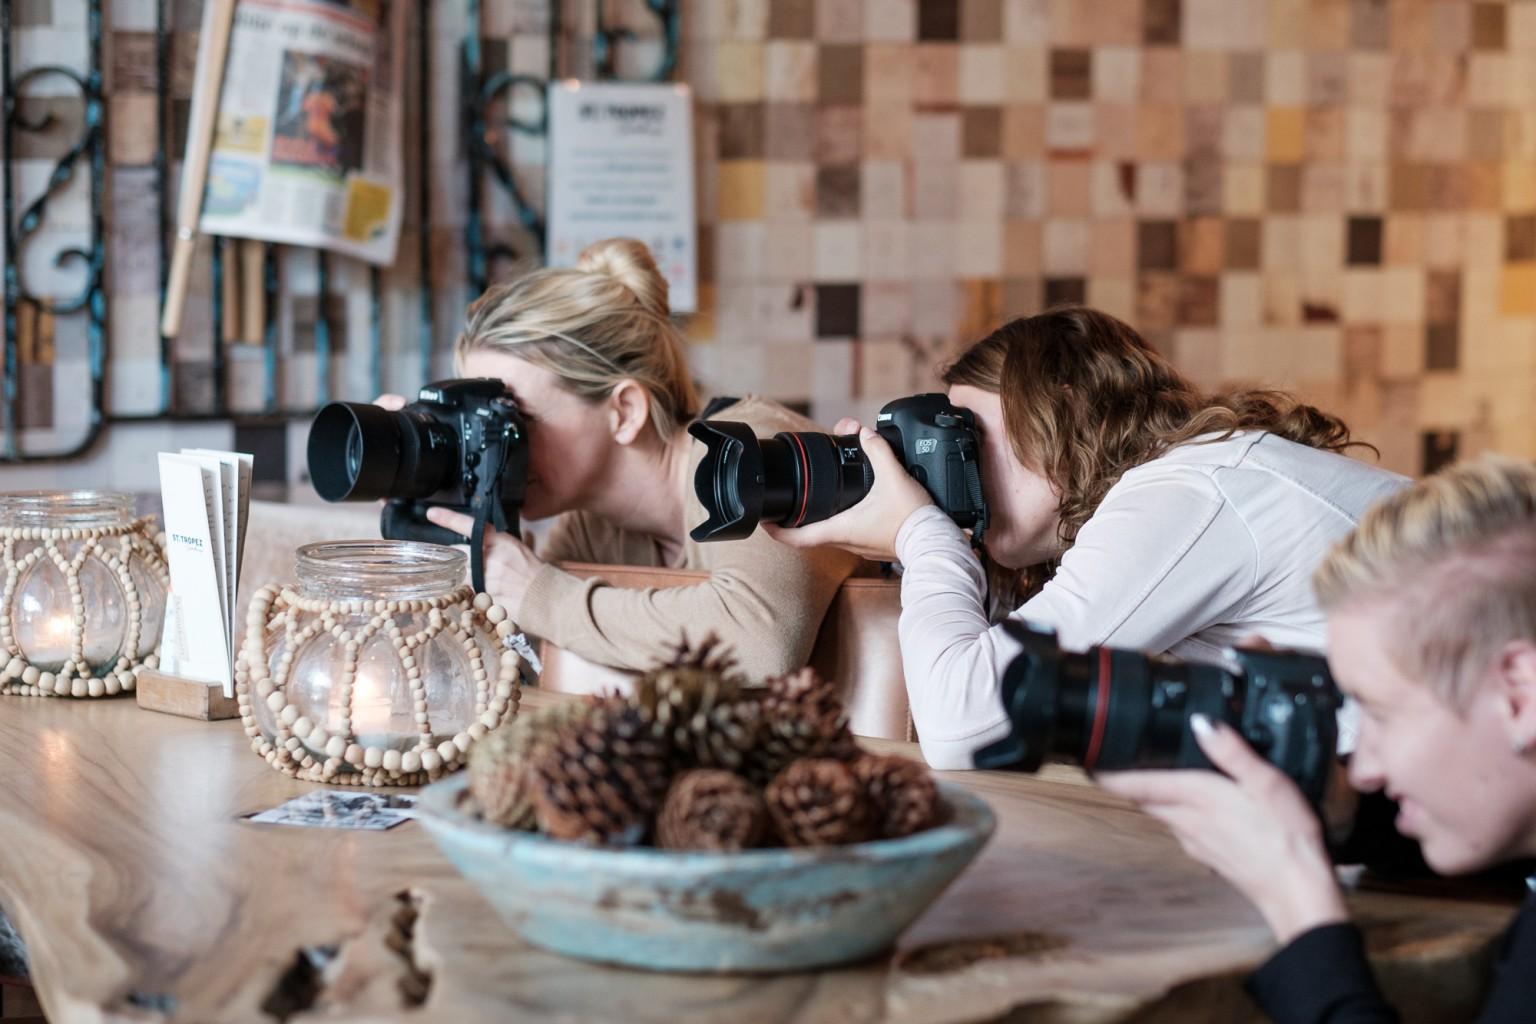 Workshop bruidsfotografie door bruidsfotograaf Peter Lammers